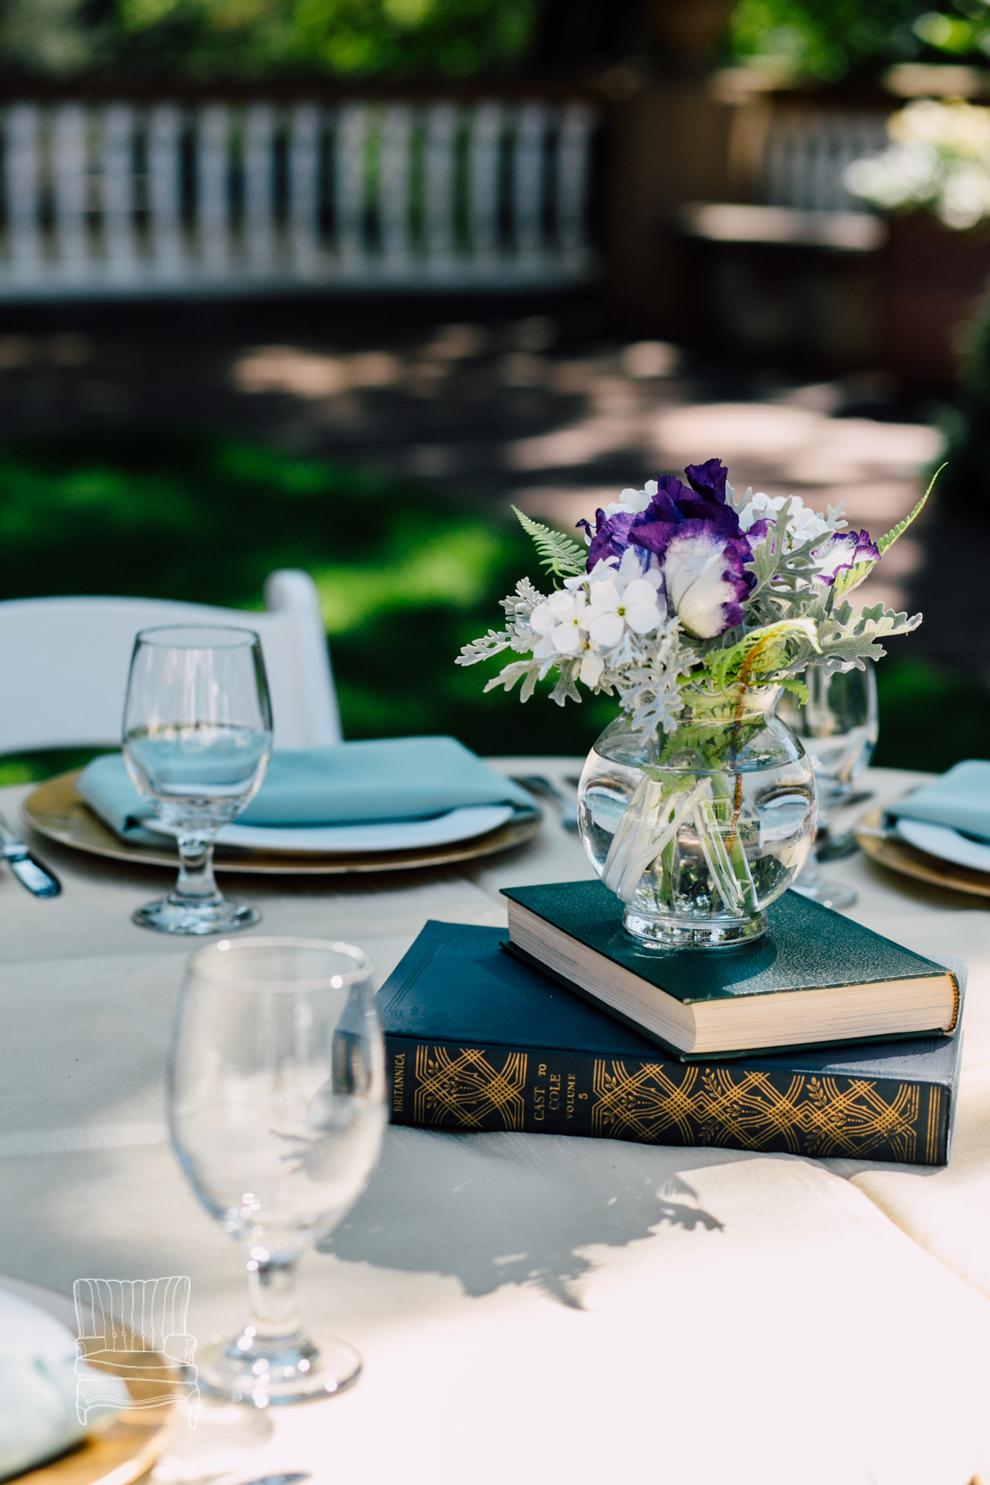 012-lairmont-manor-bellingham-washington-wedding-venue-katheryn-moran-photography-marketing.jpg